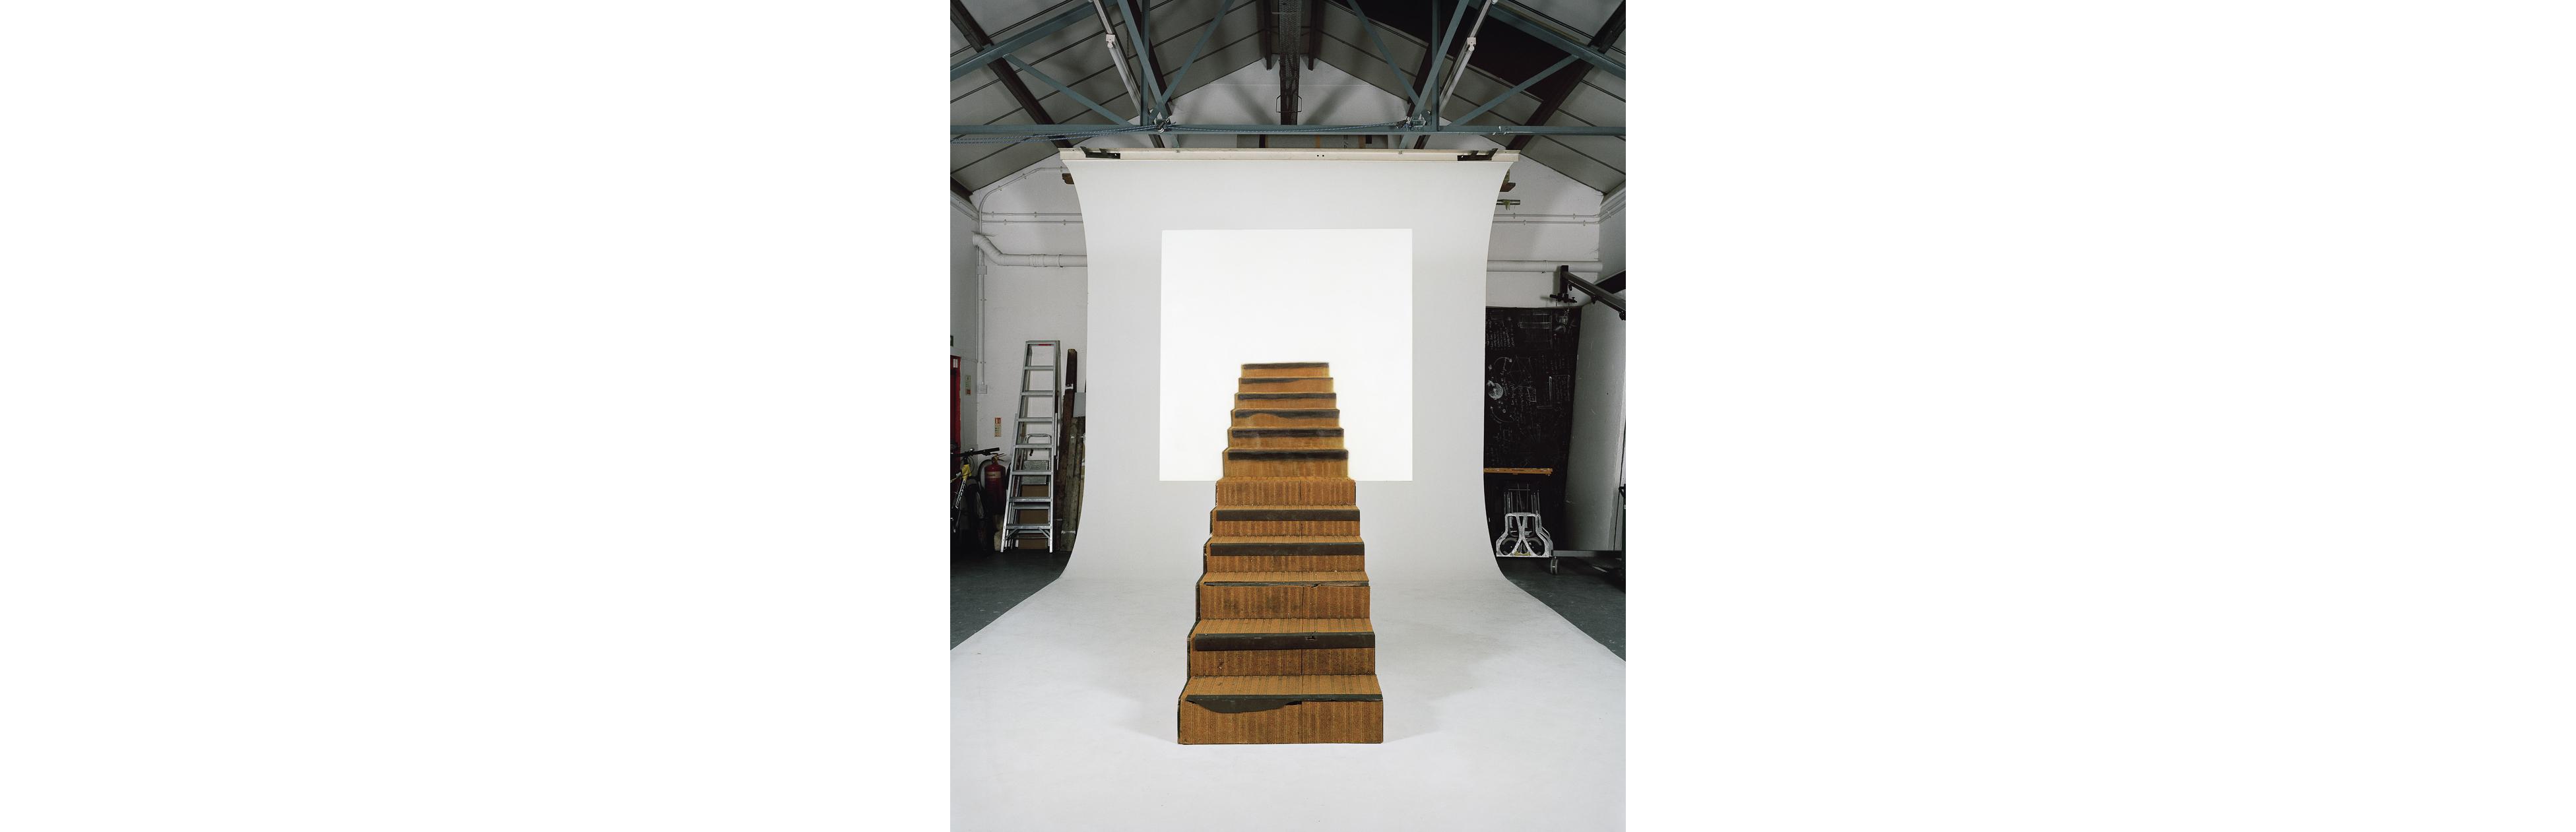 Won, Seo-yeoung _Stairs 130x160cm C-Print 2011